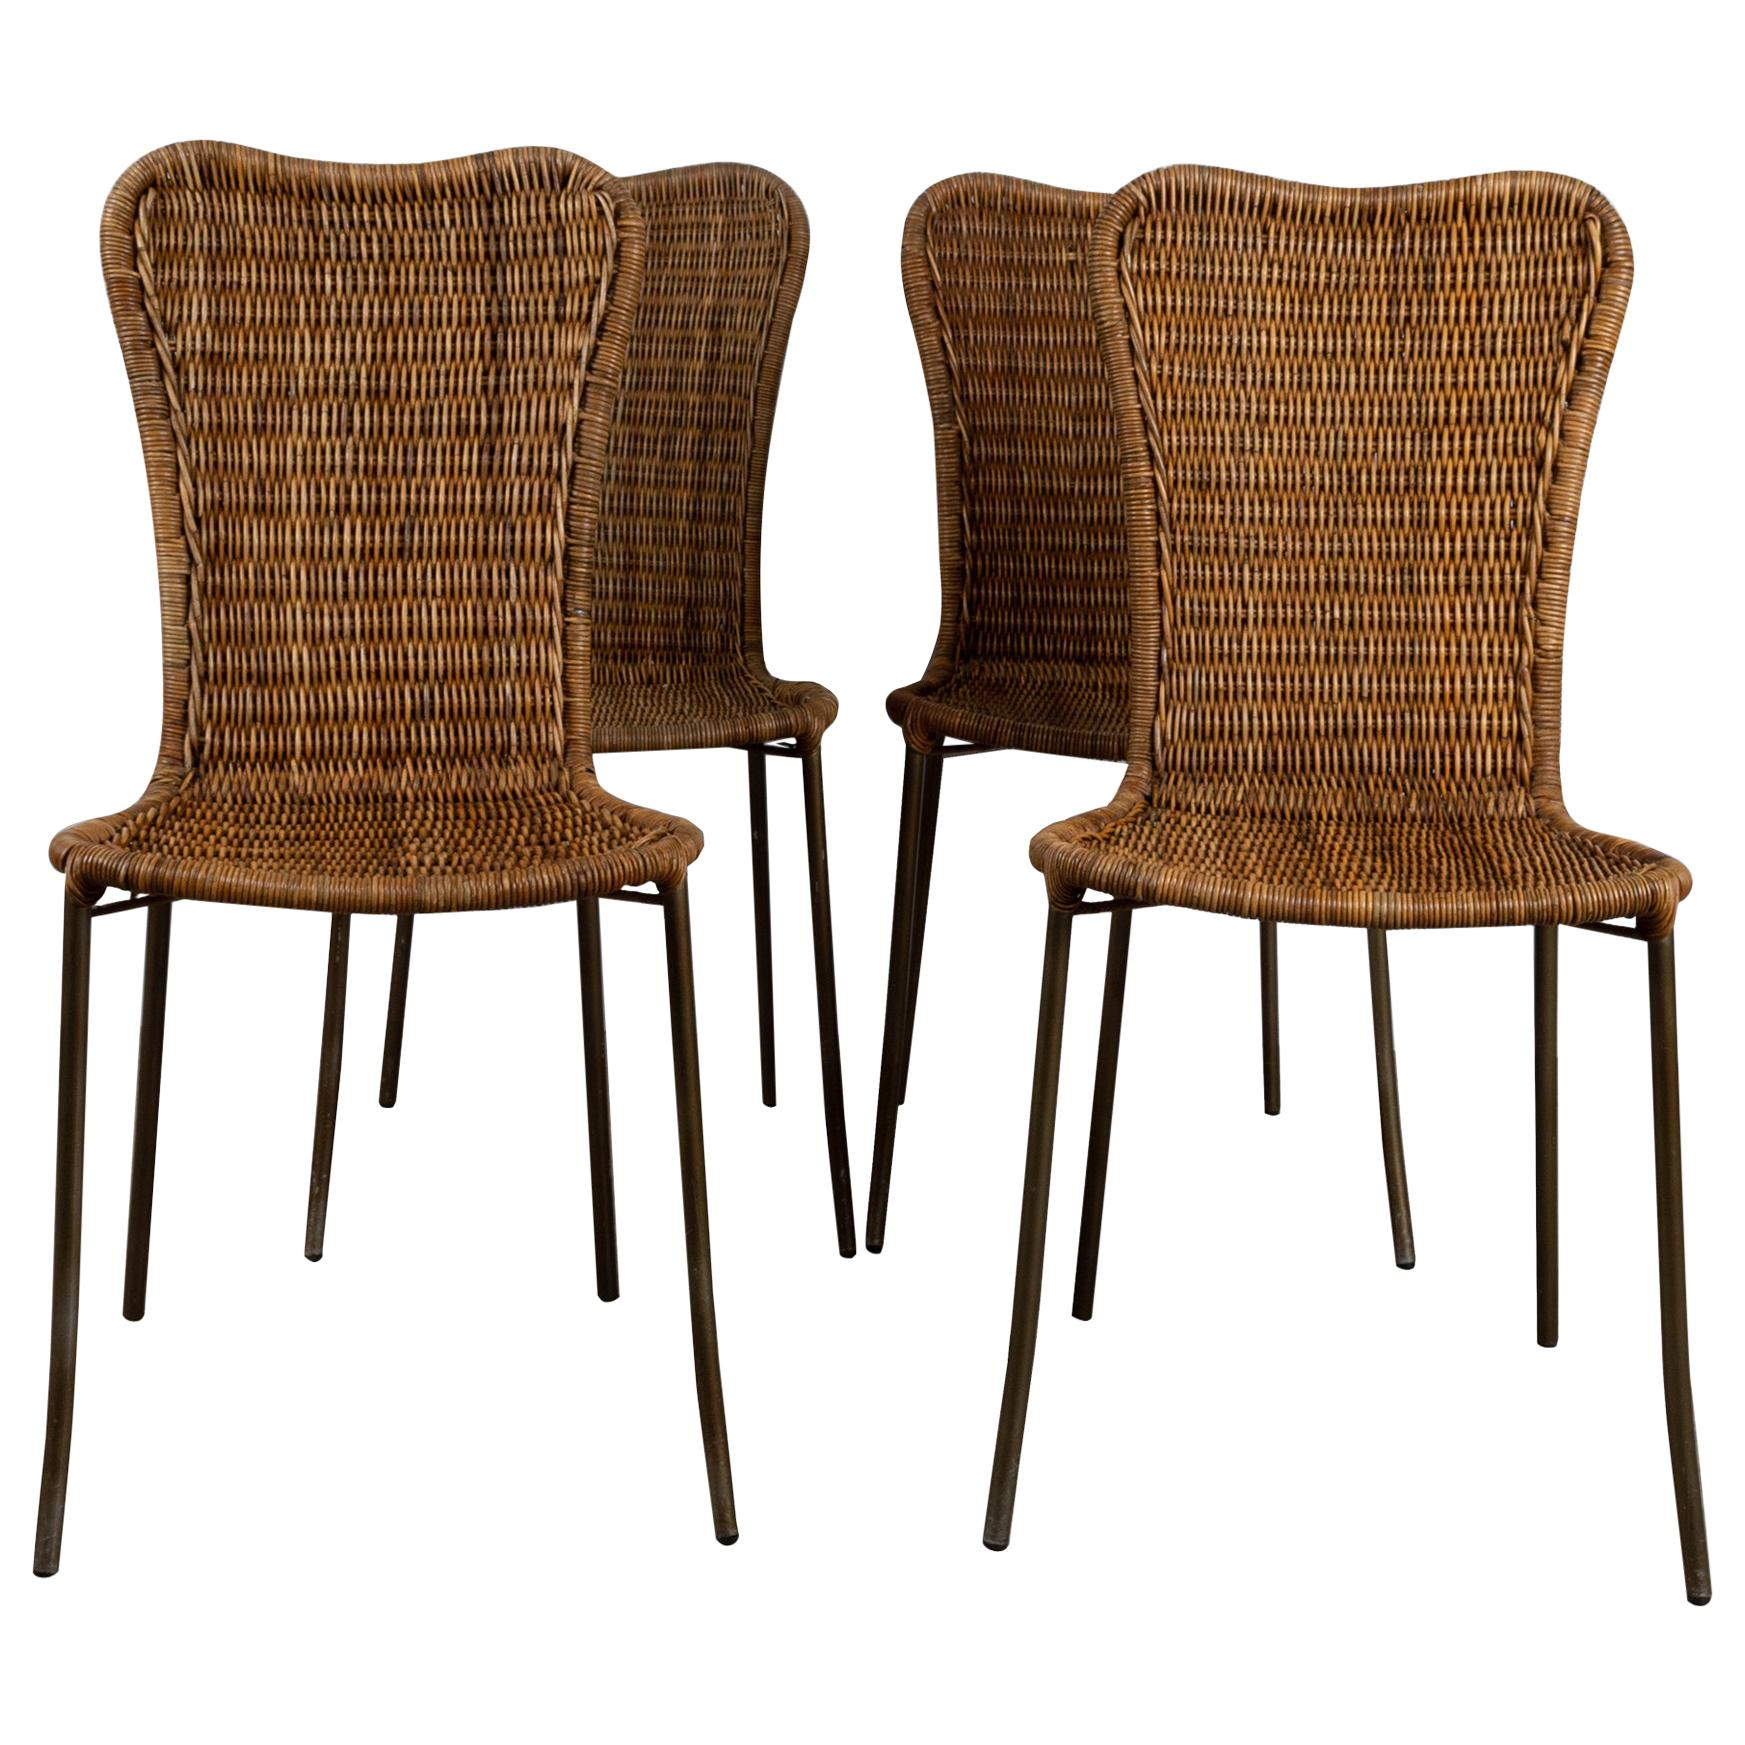 Italian Wicker Dining Chairs in Franco Campo & Carlo Graffi Style, Italy